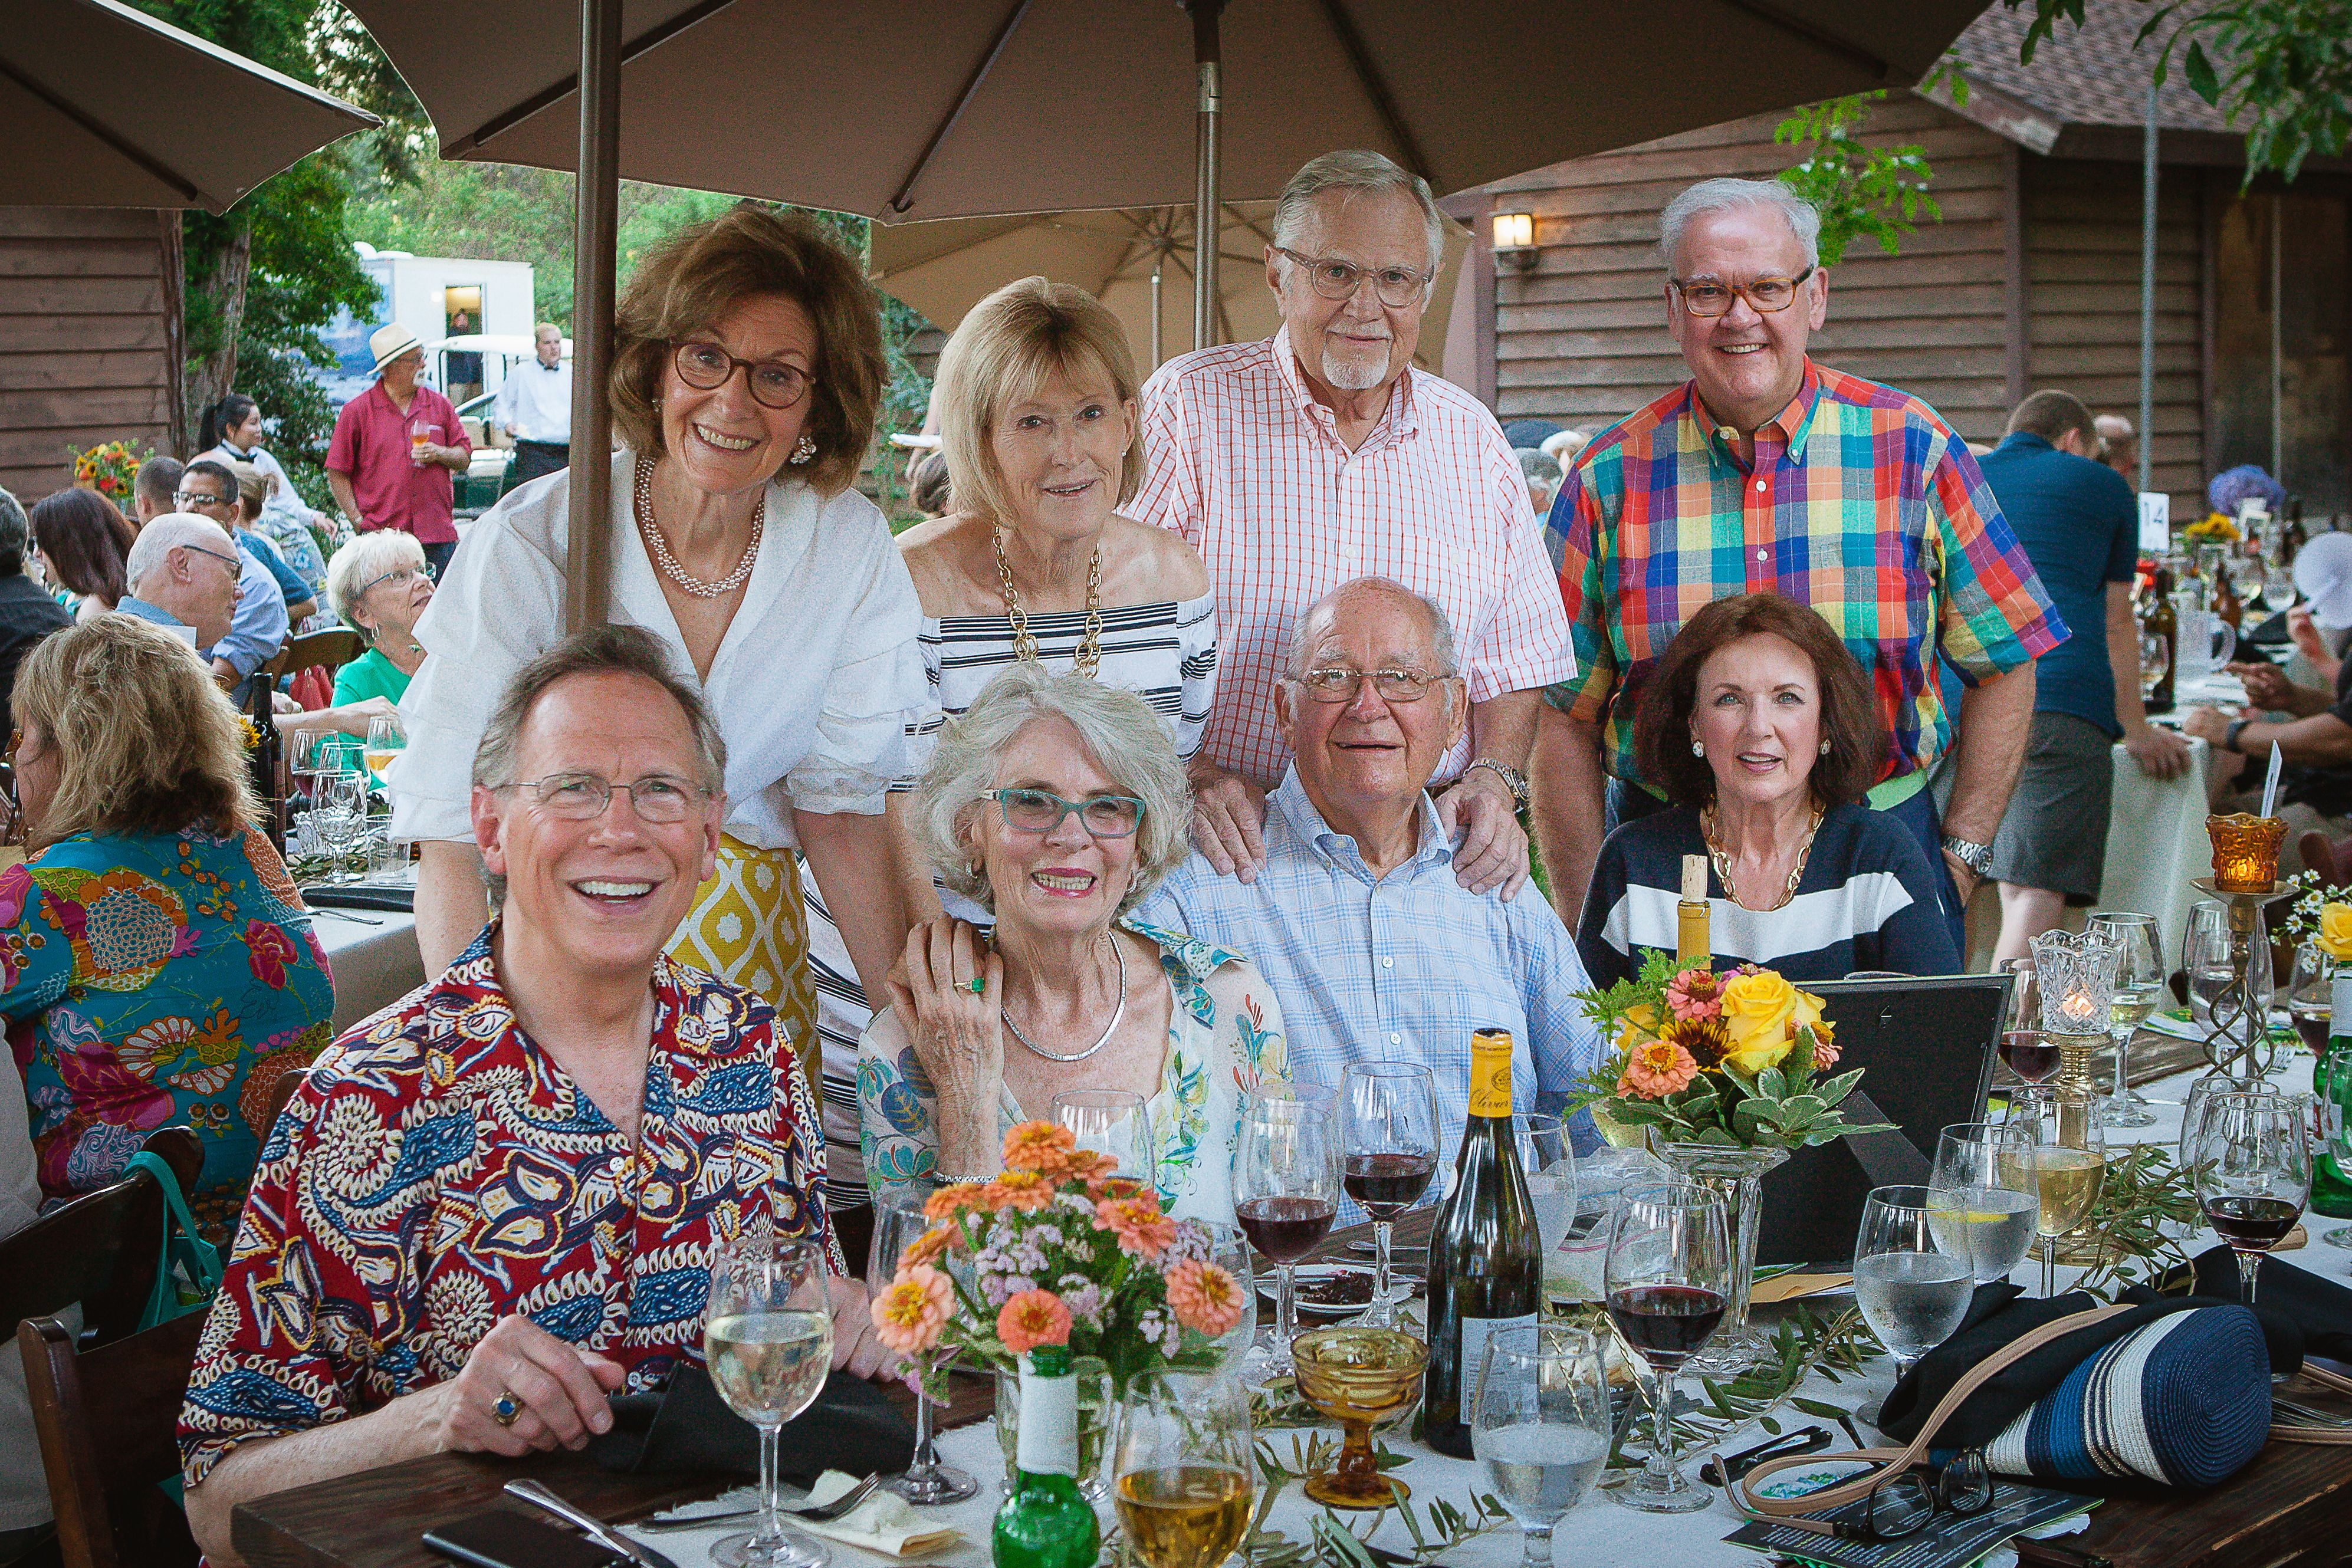 9th Annual Guest Chef Series celebrates local abundance